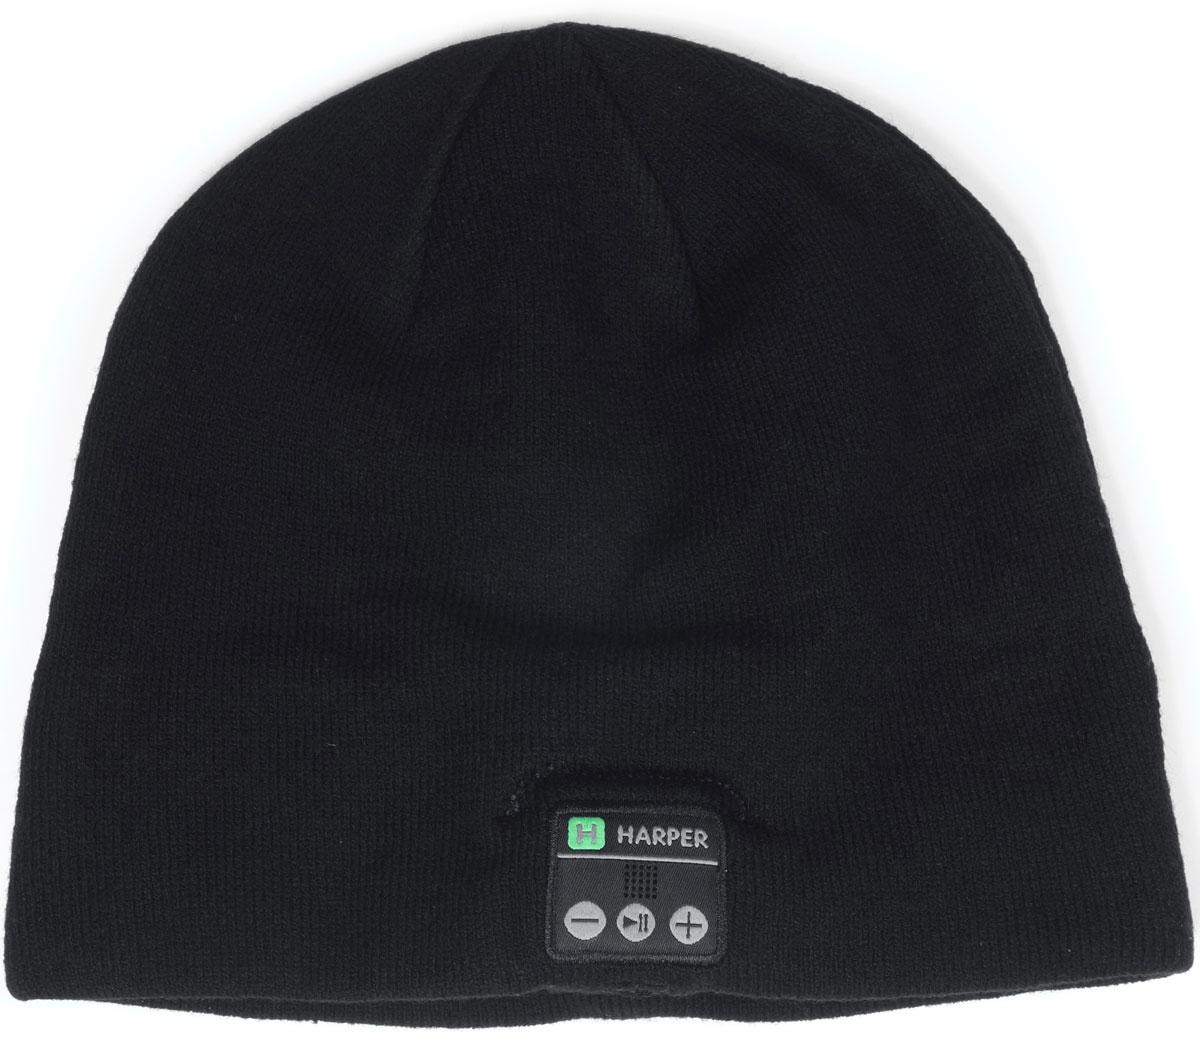 Harper HB-505, Black шапка с Bluetooth-гарнитурой - Bluetooth-гарнитуры